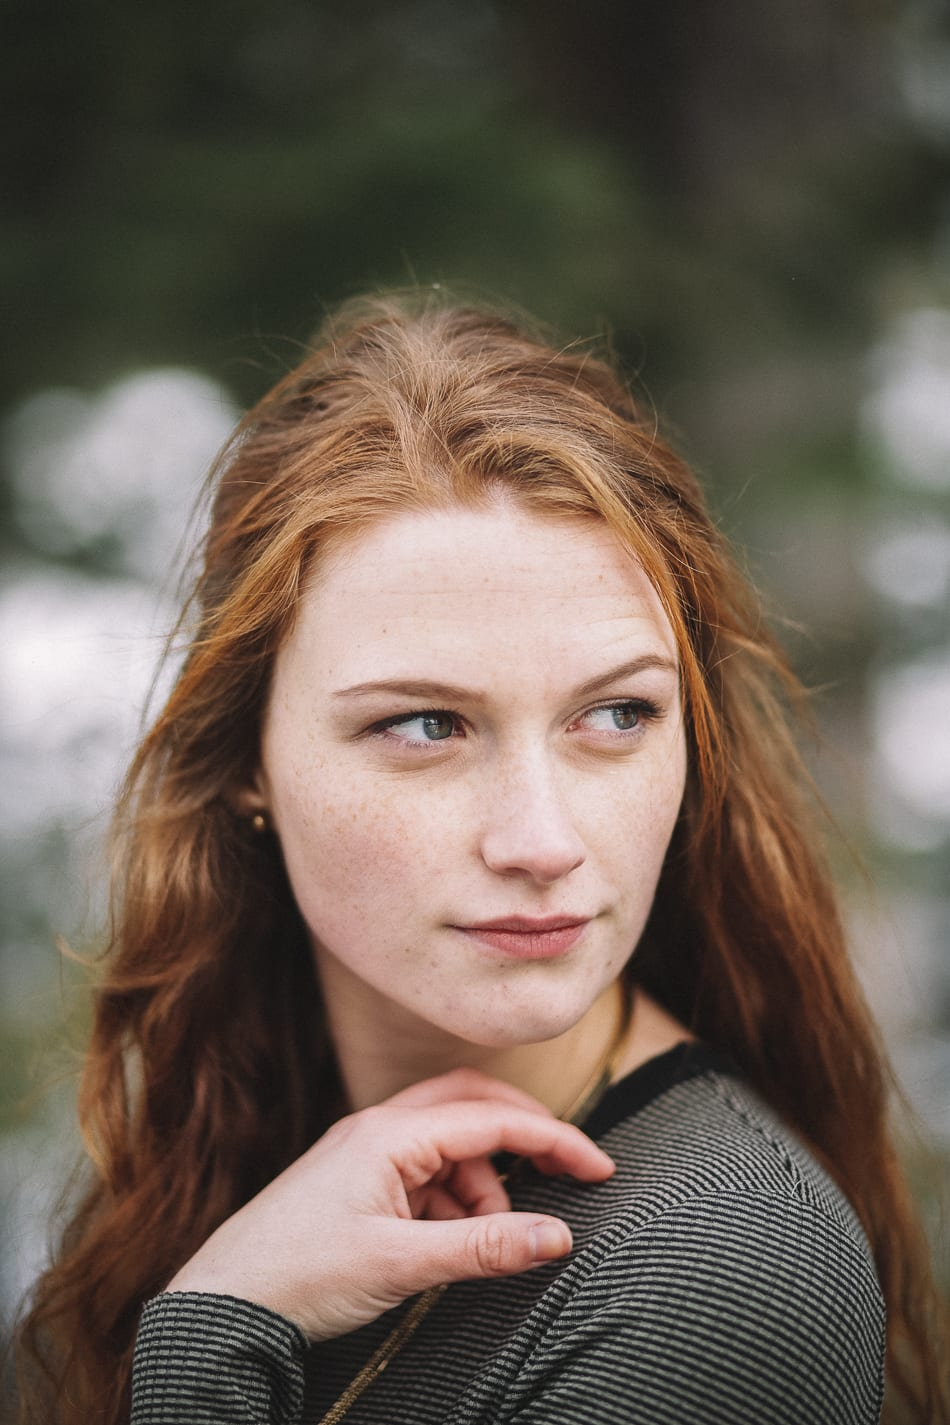 mount-lassen-winter-portrait-photo-14